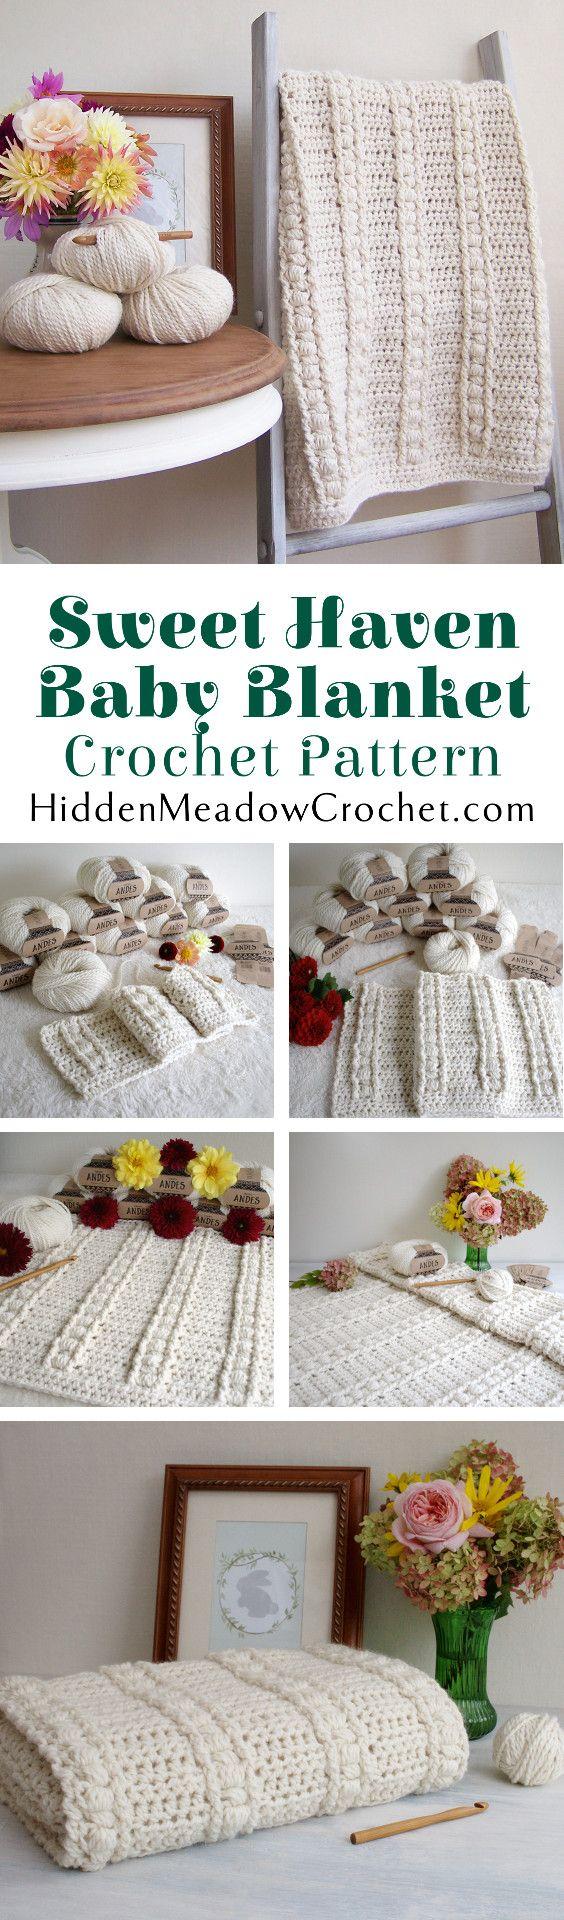 716 best crochet baby blankets images on pinterest carpets crochet pattern sweet haven baby blanket p124 bankloansurffo Gallery